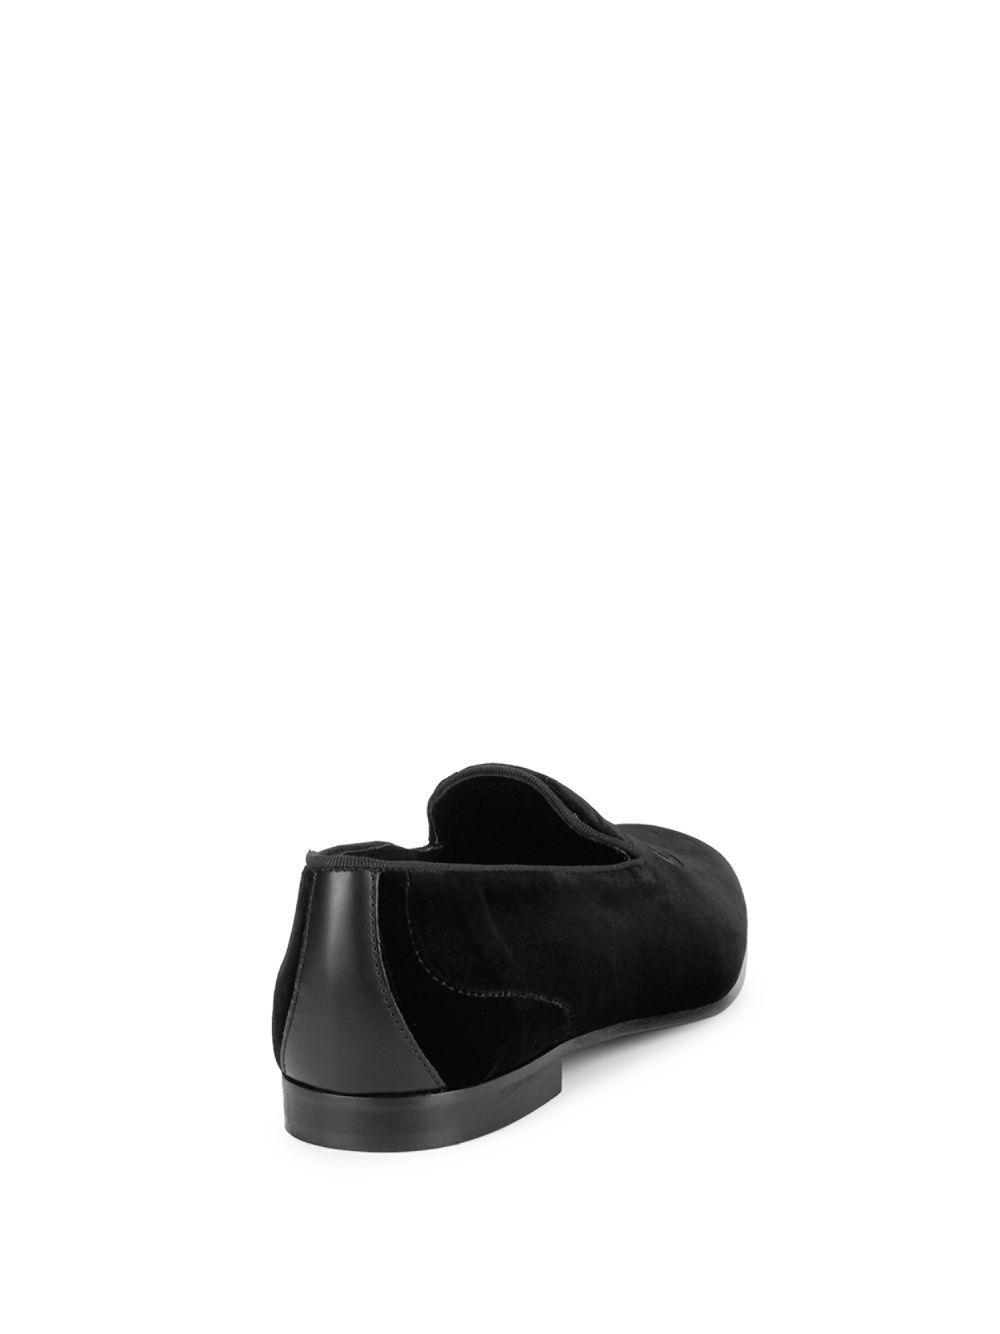 1deefae736d Lyst - Bruno Magli Sorano Loafer in Black for Men - Save 60%